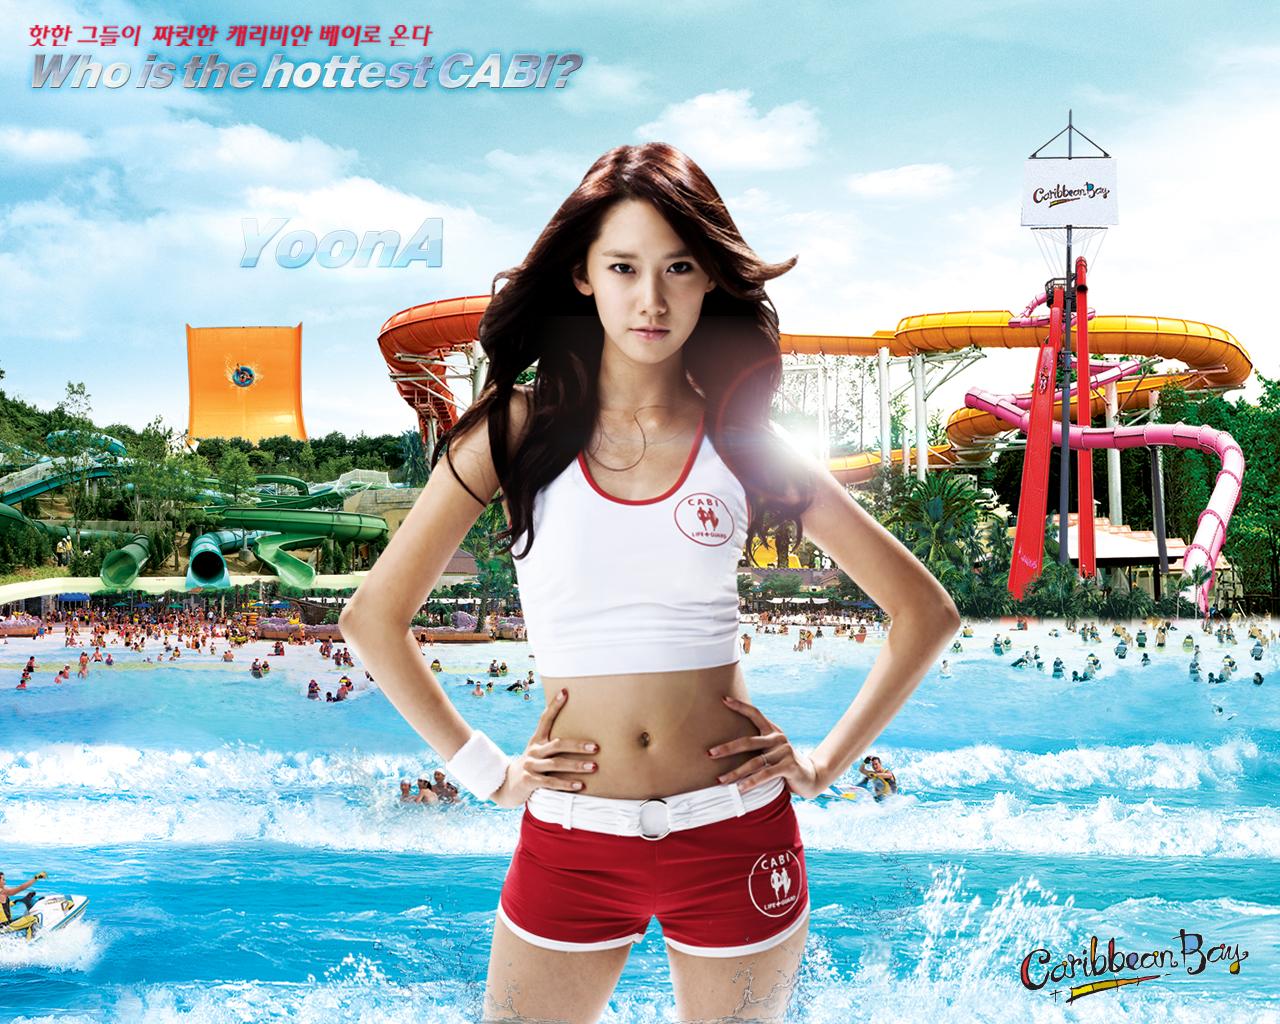 http://2.bp.blogspot.com/-P7dH0_m80gY/TnsWnSttB5I/AAAAAAAAAH8/U2-89KxXrUc/s1600/Yoona+Hottest+Cabi+wallpaper+1280_1024.jpg